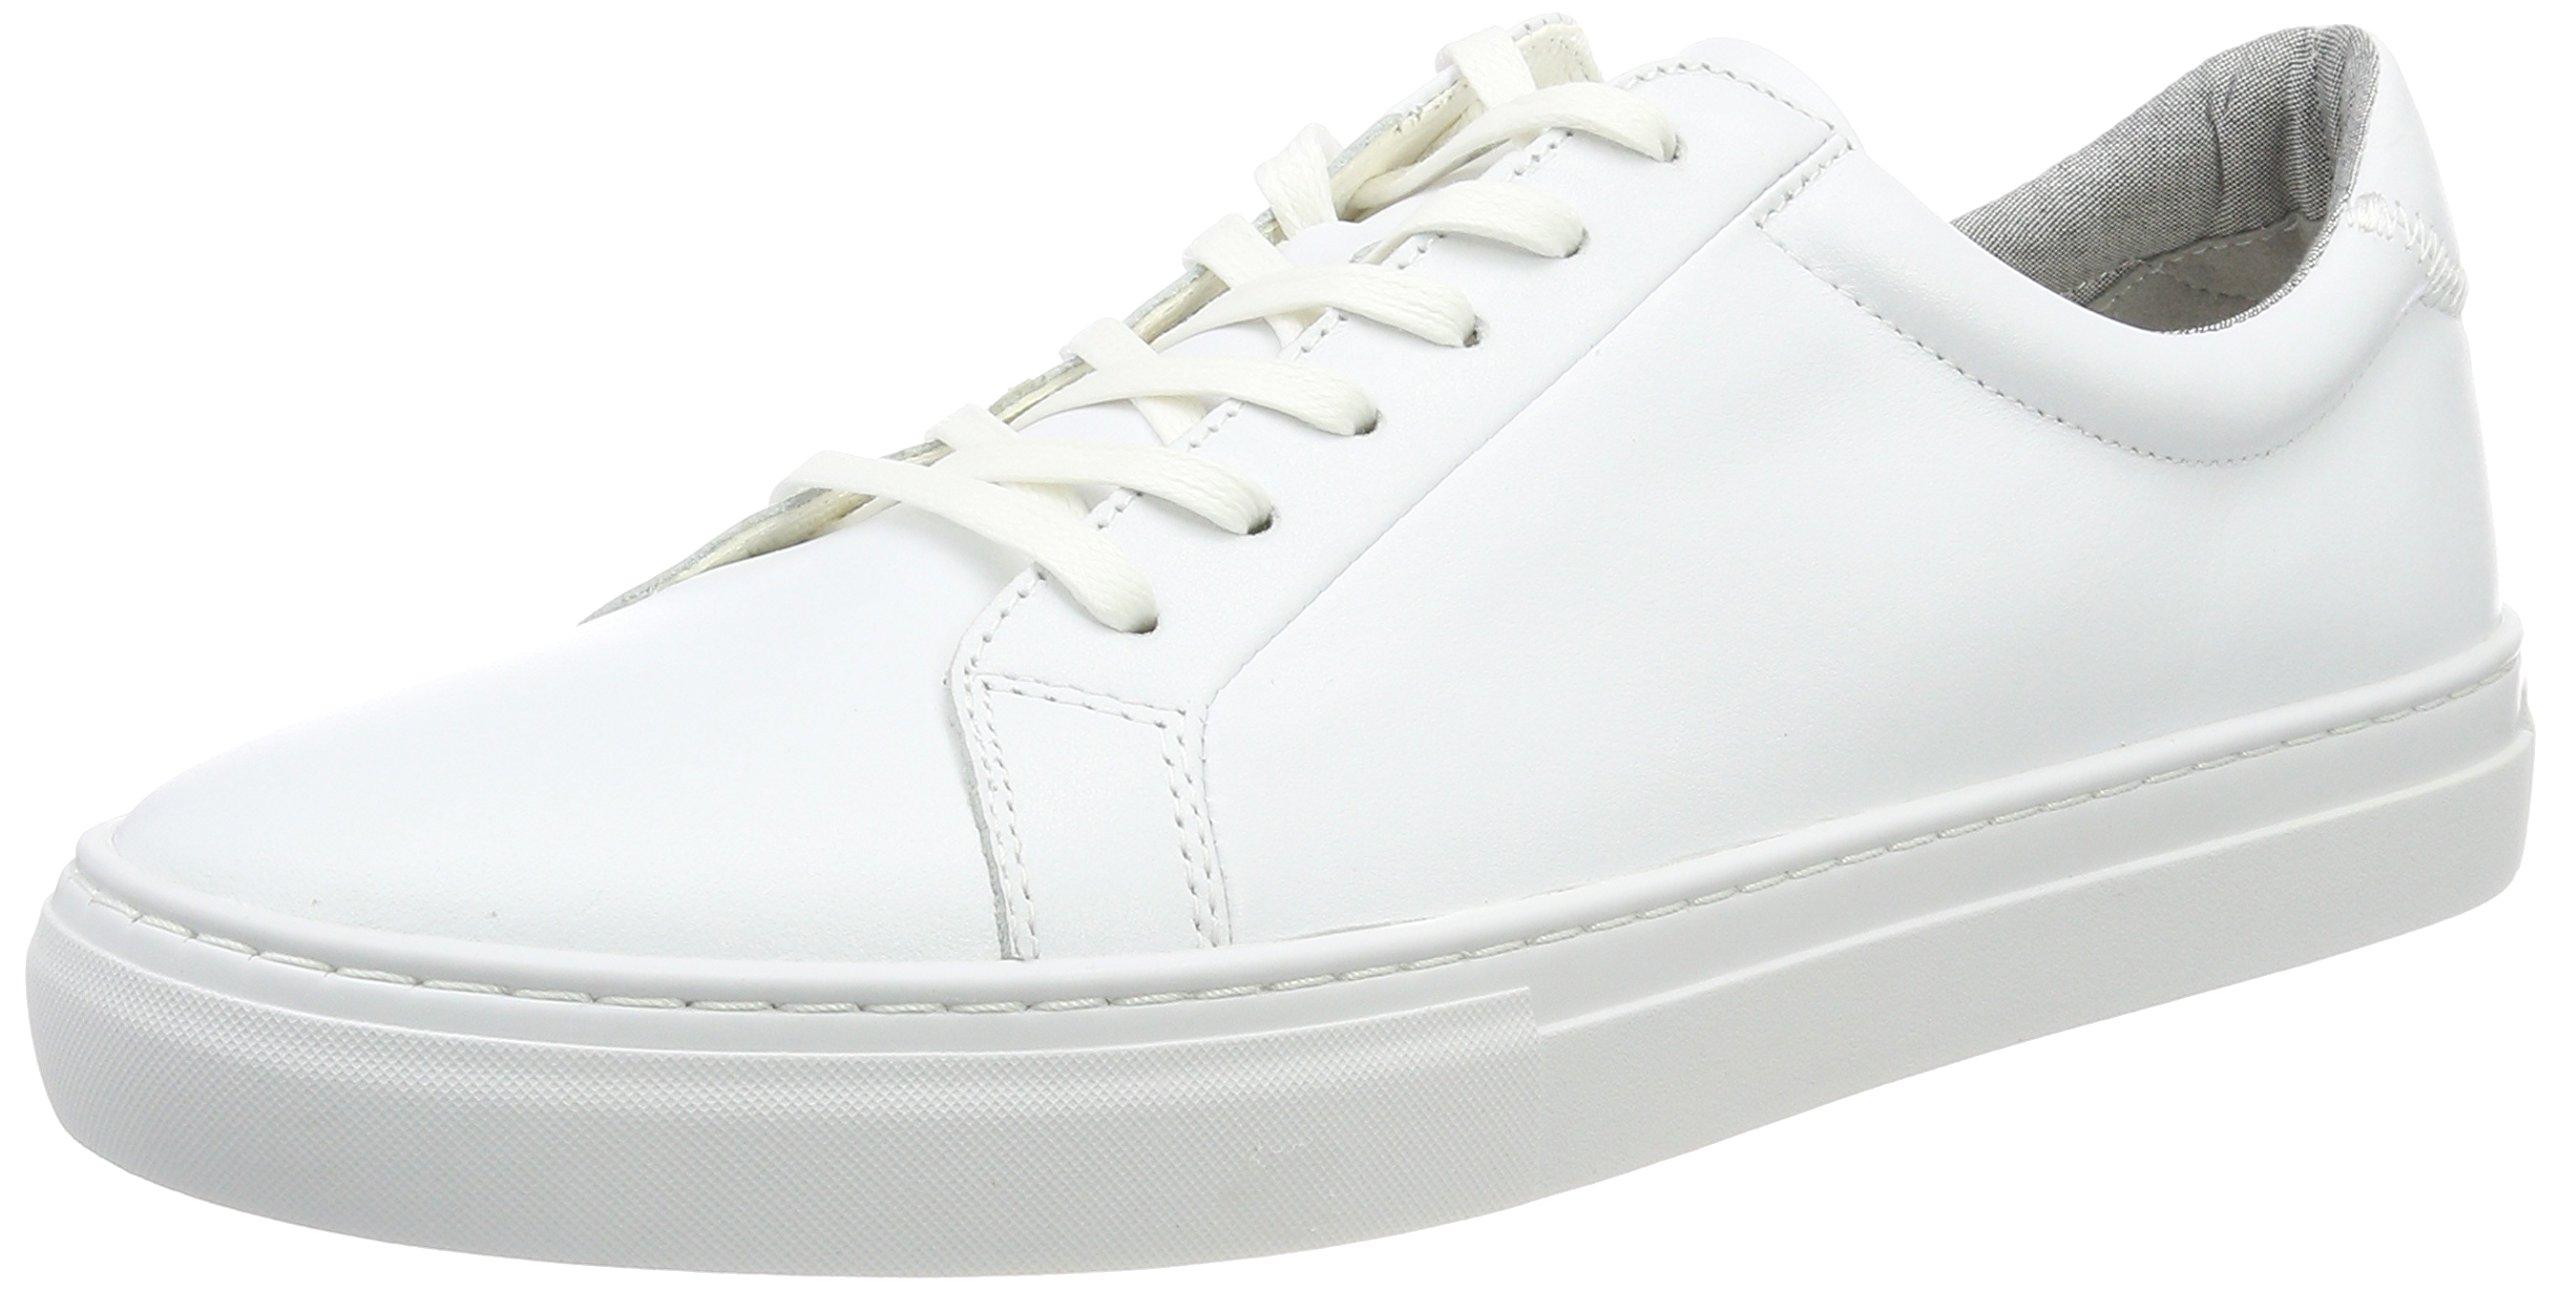 PaulSneakers Vagabond Eu Basses HommeBlancwhite 0145 qVzMpGSU